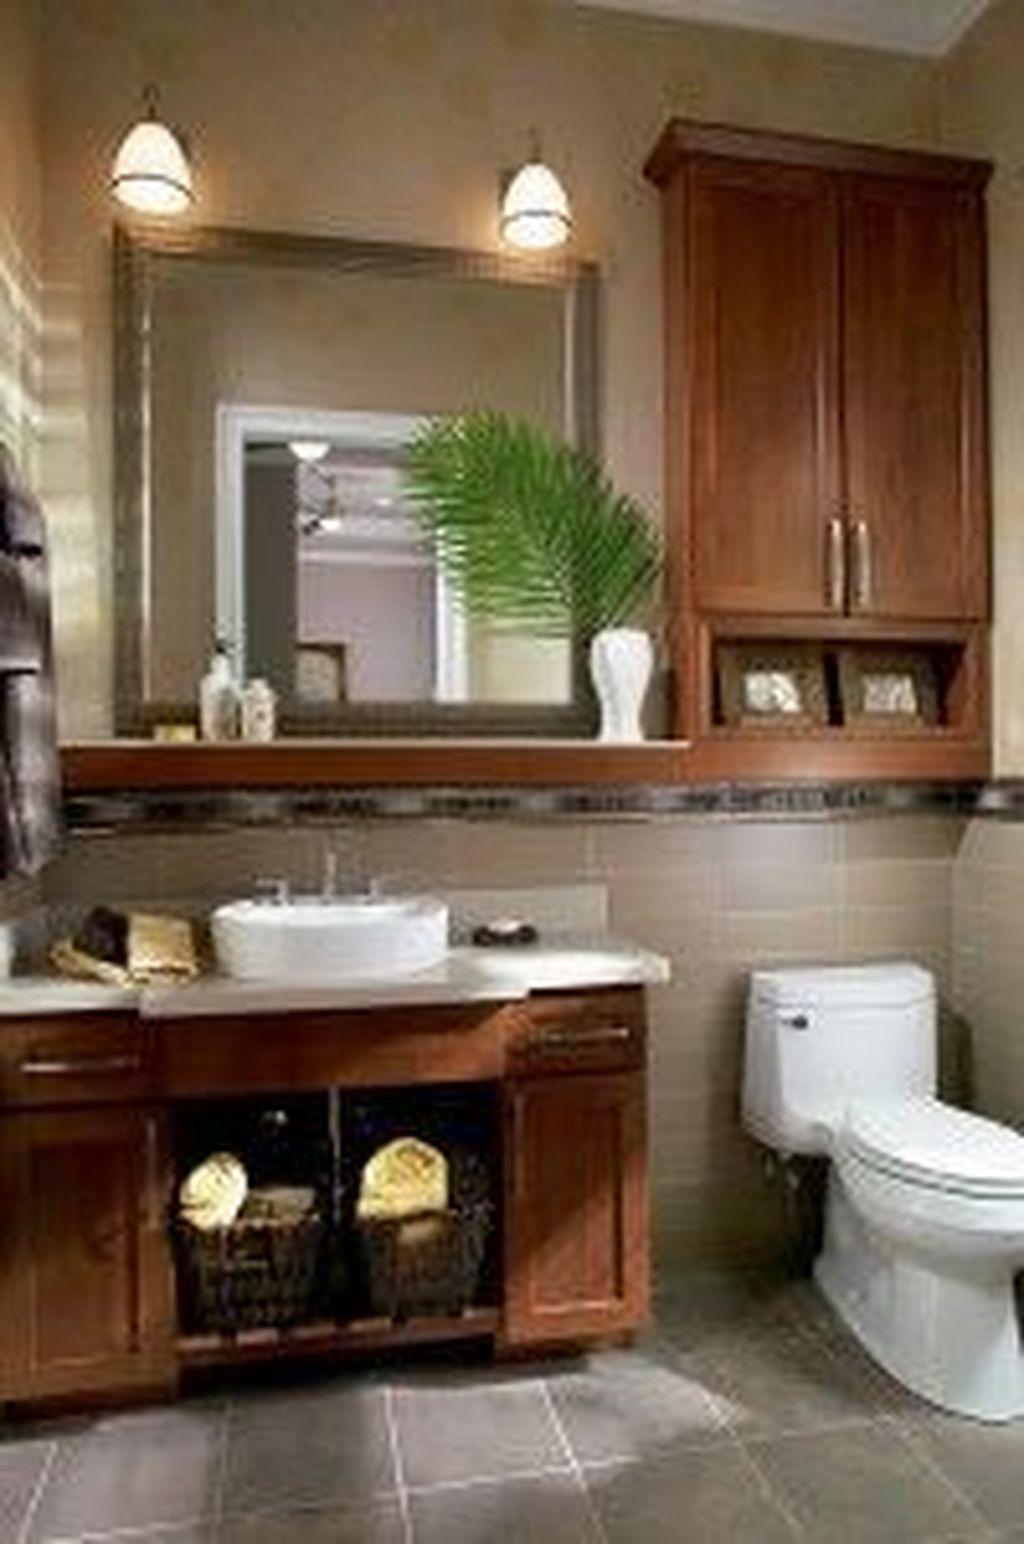 39 Perfect Bathroom Cabinet Remodel Ideas Bathroom Cabinets Designs Bathroom Cabinets Over Toilet Small Bathroom Cabinets